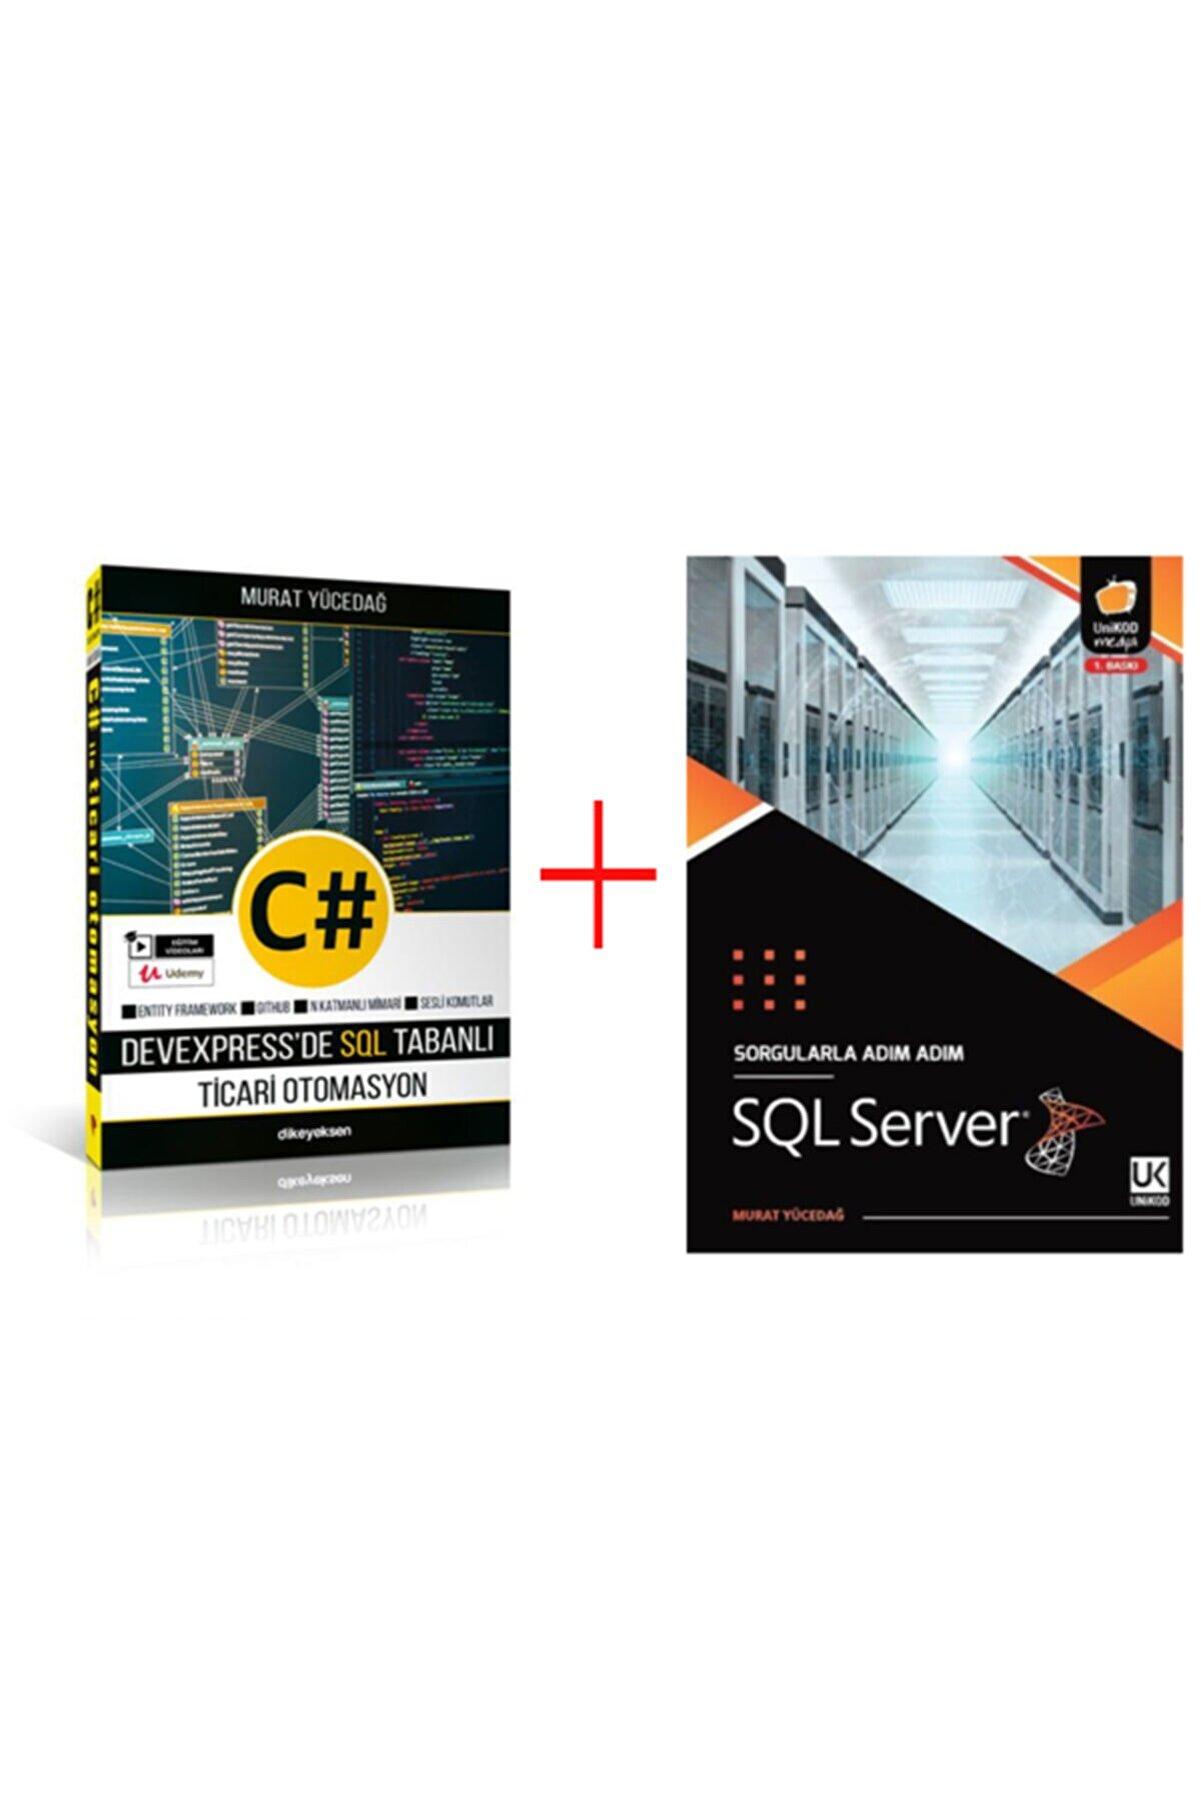 Madamcarlotta Murat Yücedağ Sql Server & Devexpress'de Sql Tabanlı Ticari Otomasyon